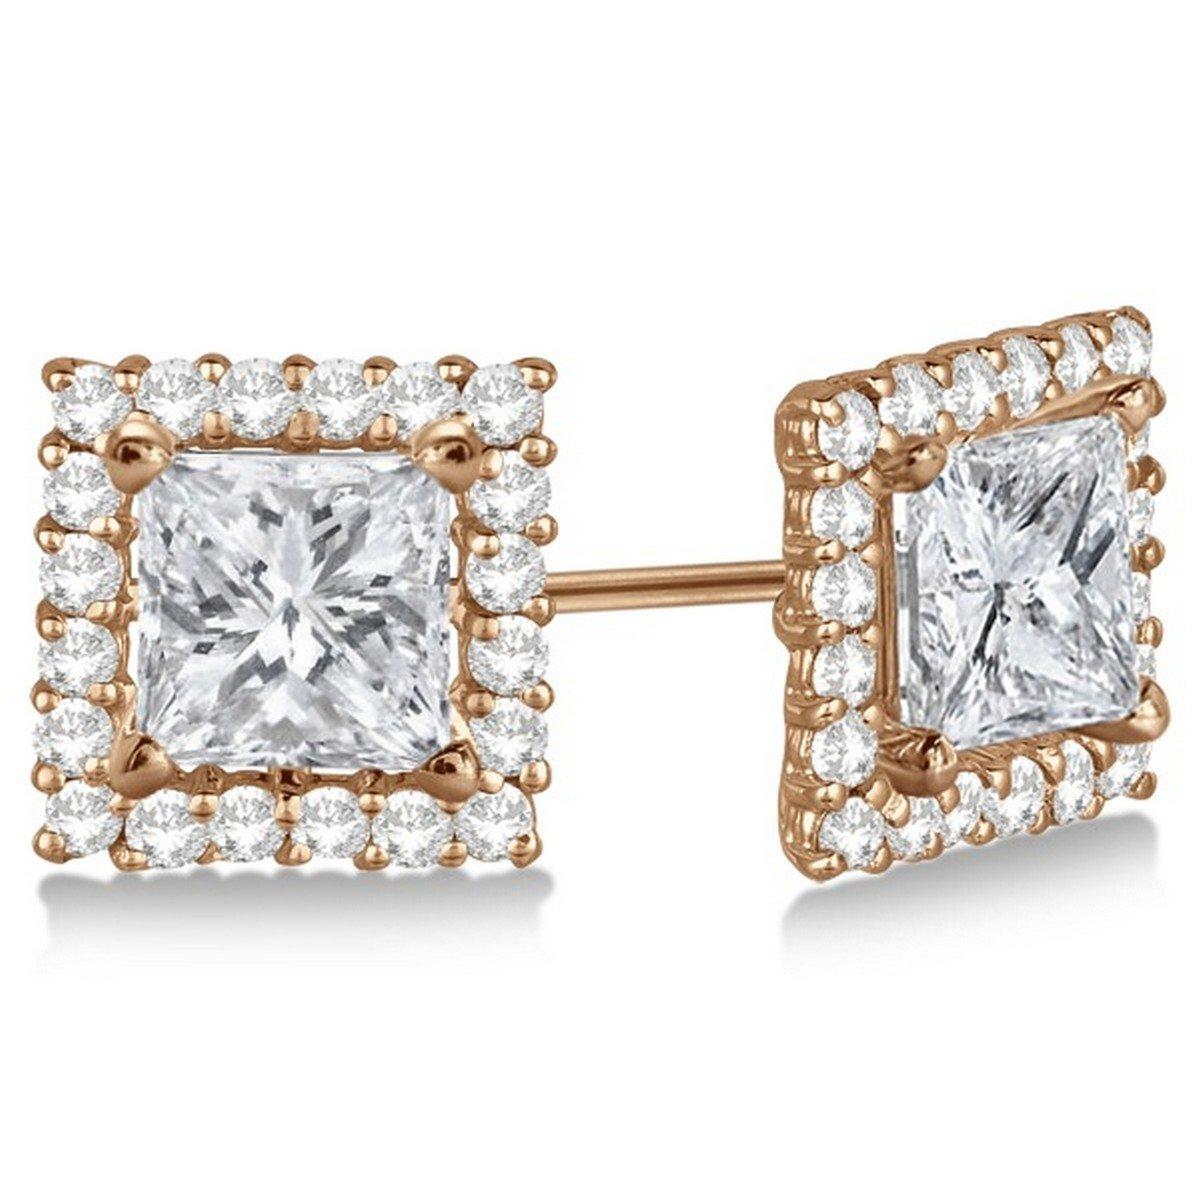 14k Gold 0.77 Carat Contemporary 7 Millimeter Womens Square Diamond Earring Jackets Pave-Set